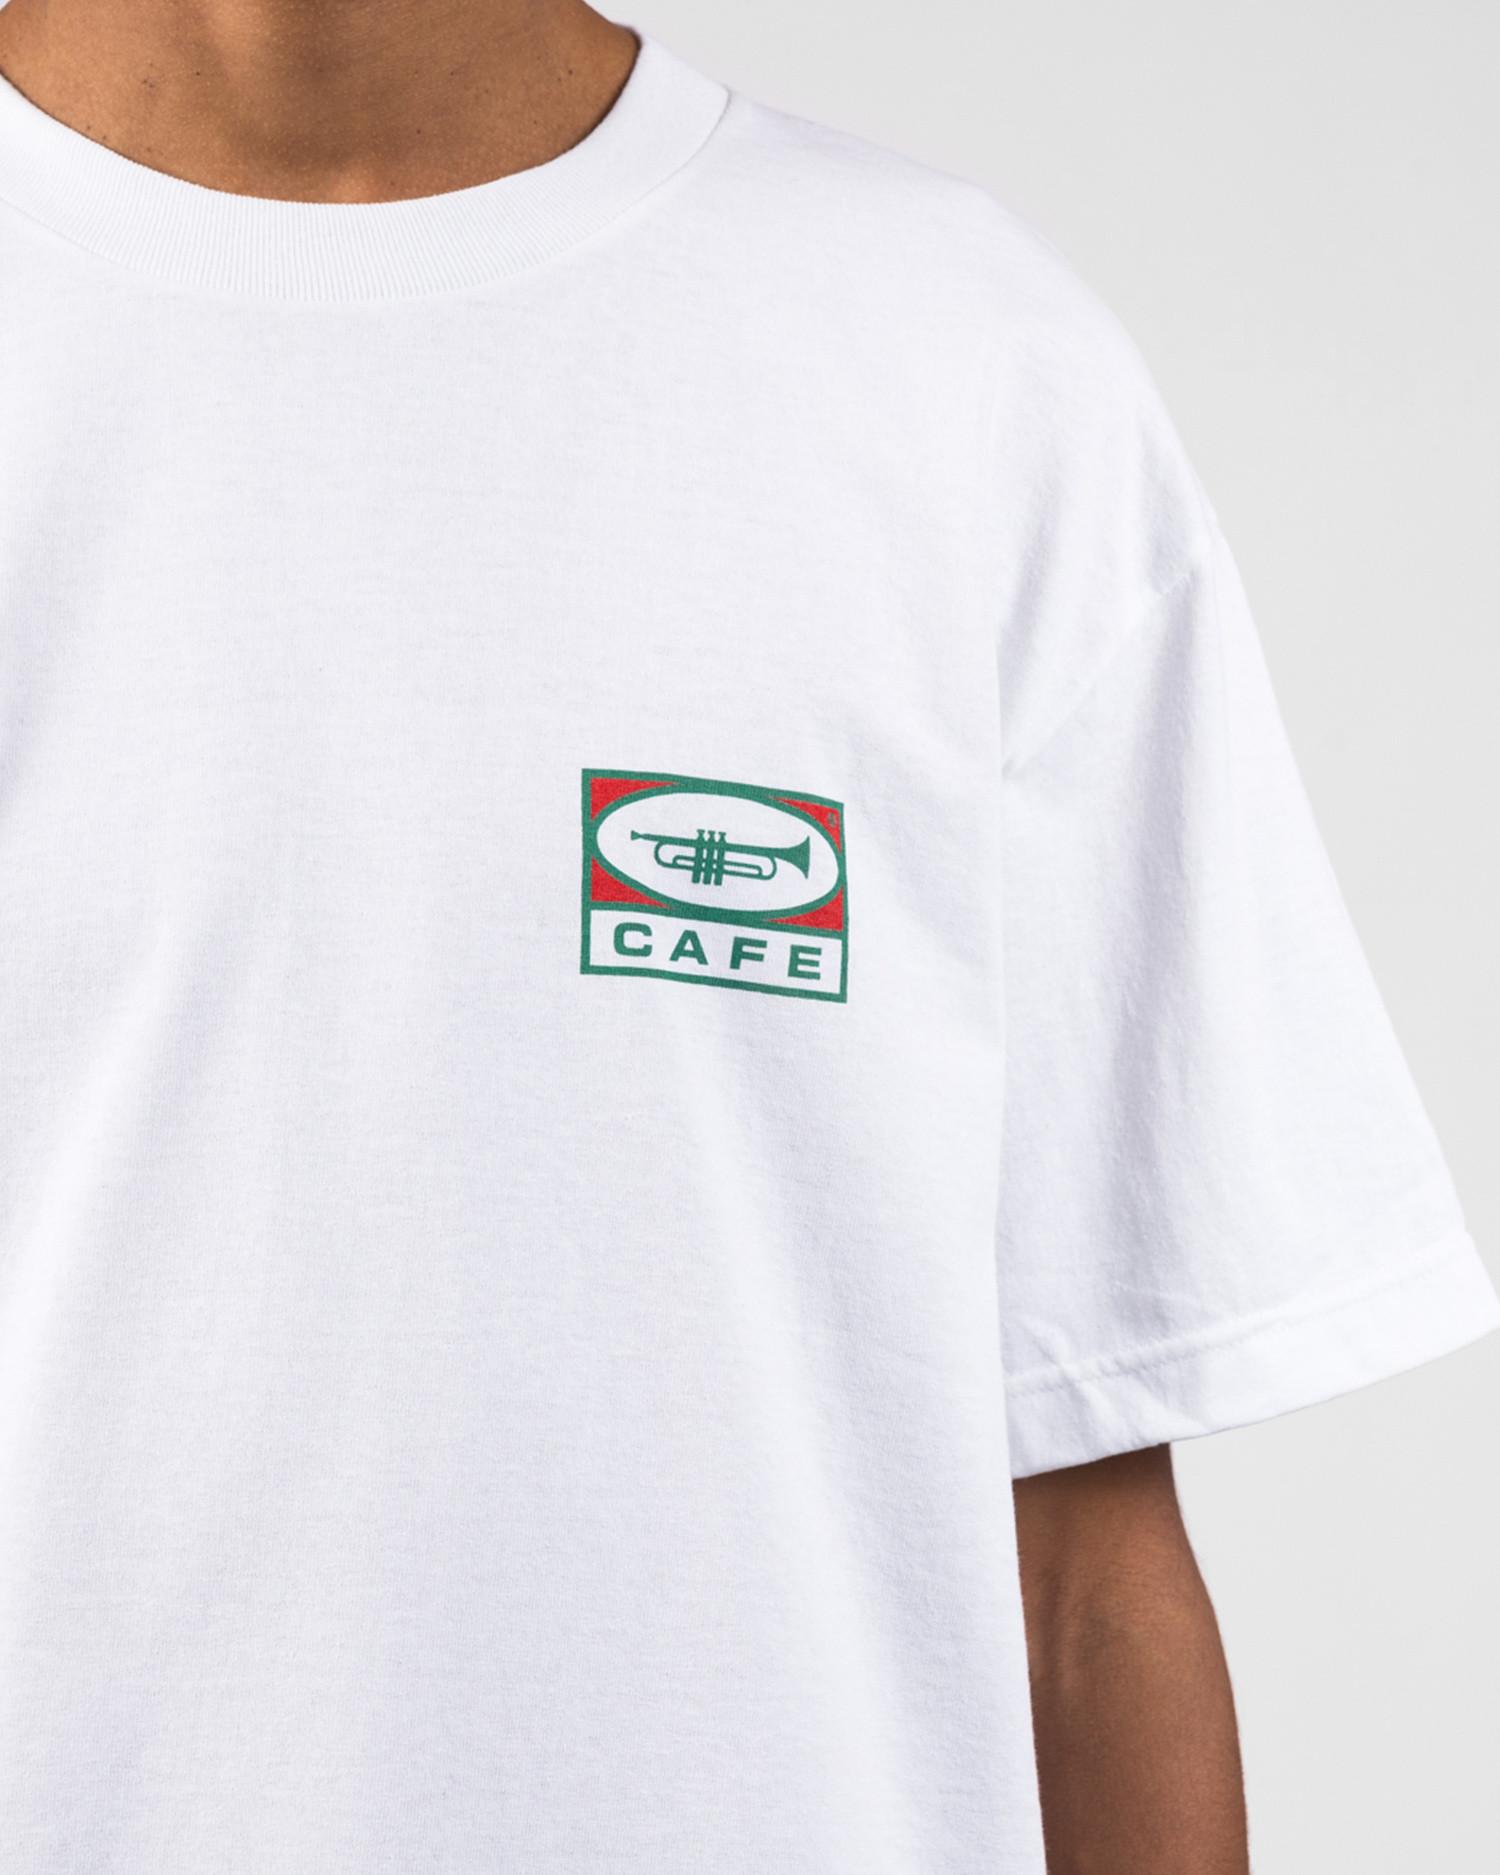 Skateboard Cafe 45 Tee White